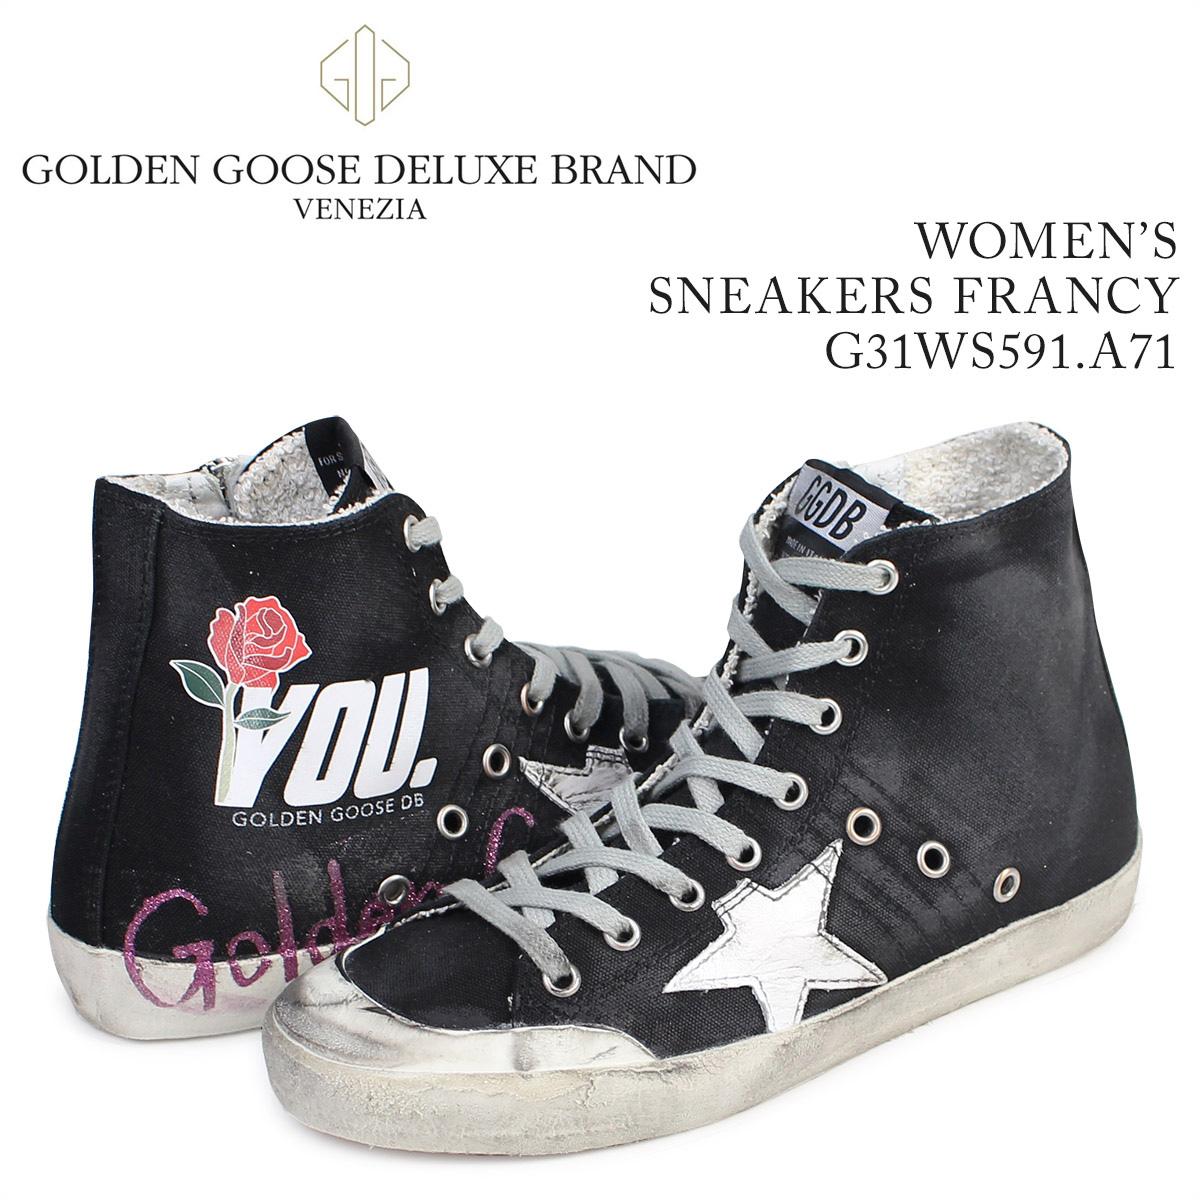 Golden Goose ゴールデングース スニーカー レディース フランシー SNEAKERS FRANCY イタリア製 G31WS591 A71 靴 ブラック